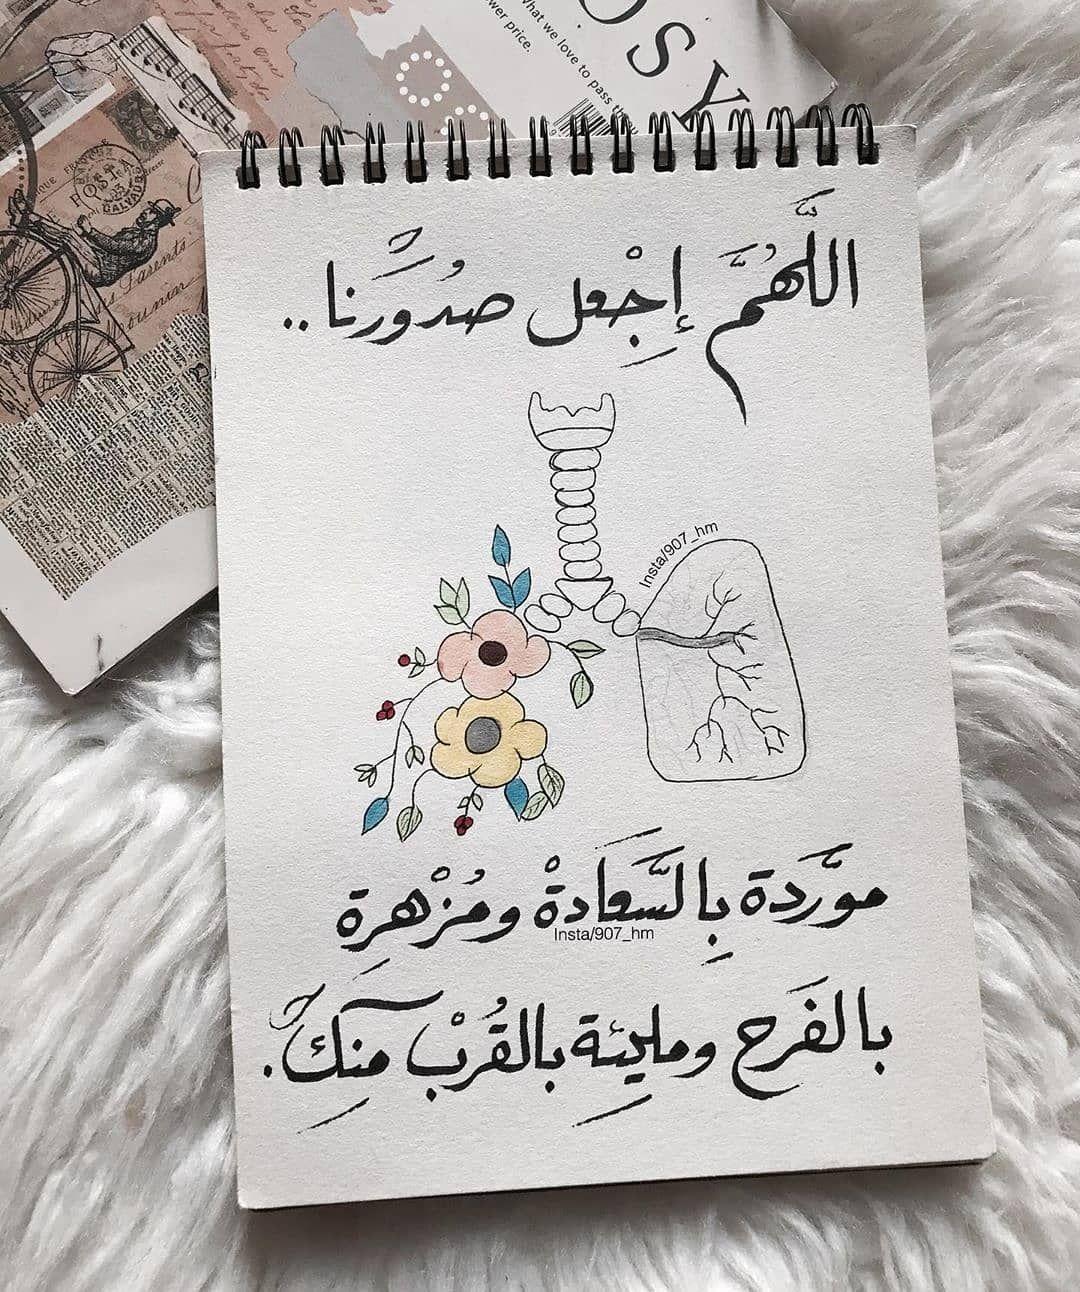 328 Mentions J Aime 3 Commentaires Arabic Calligraphy Alkhat El3arabi Sur Instagram تصوير Islamic Quotes Wallpaper Quran Quotes Love Wallpaper Quotes